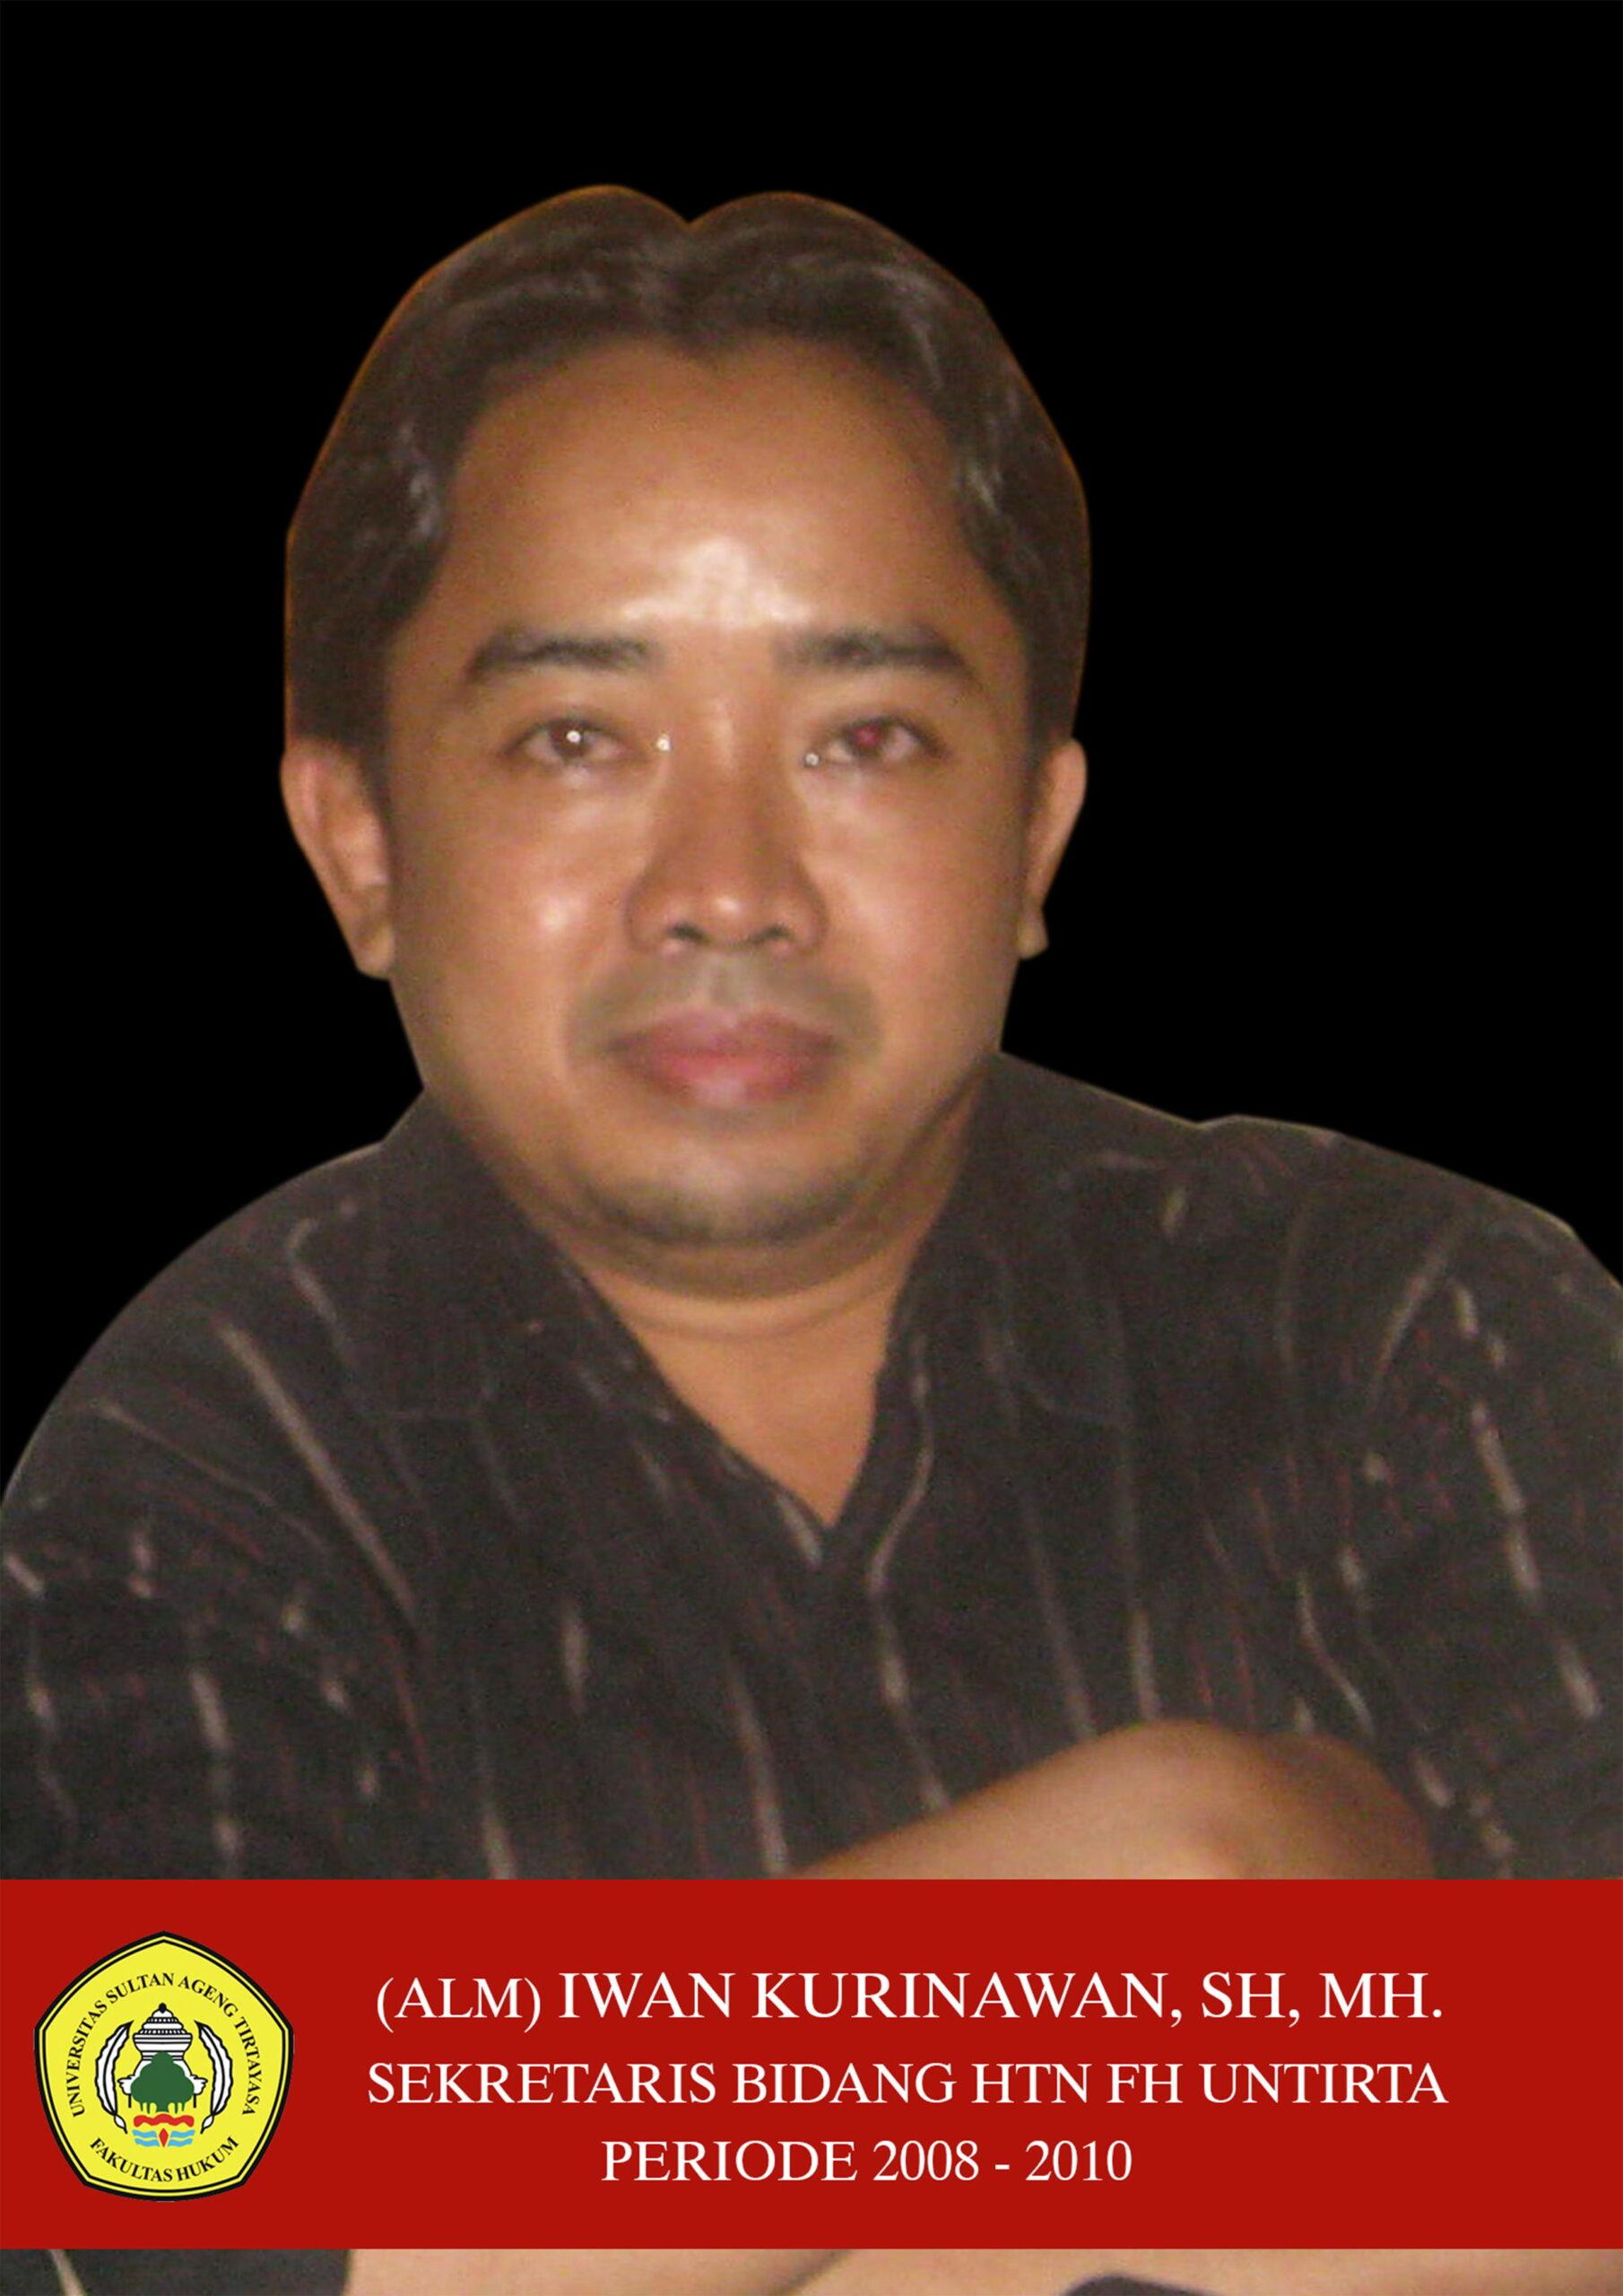 6. (Alm) Iwan Kurniawan, SH, MH